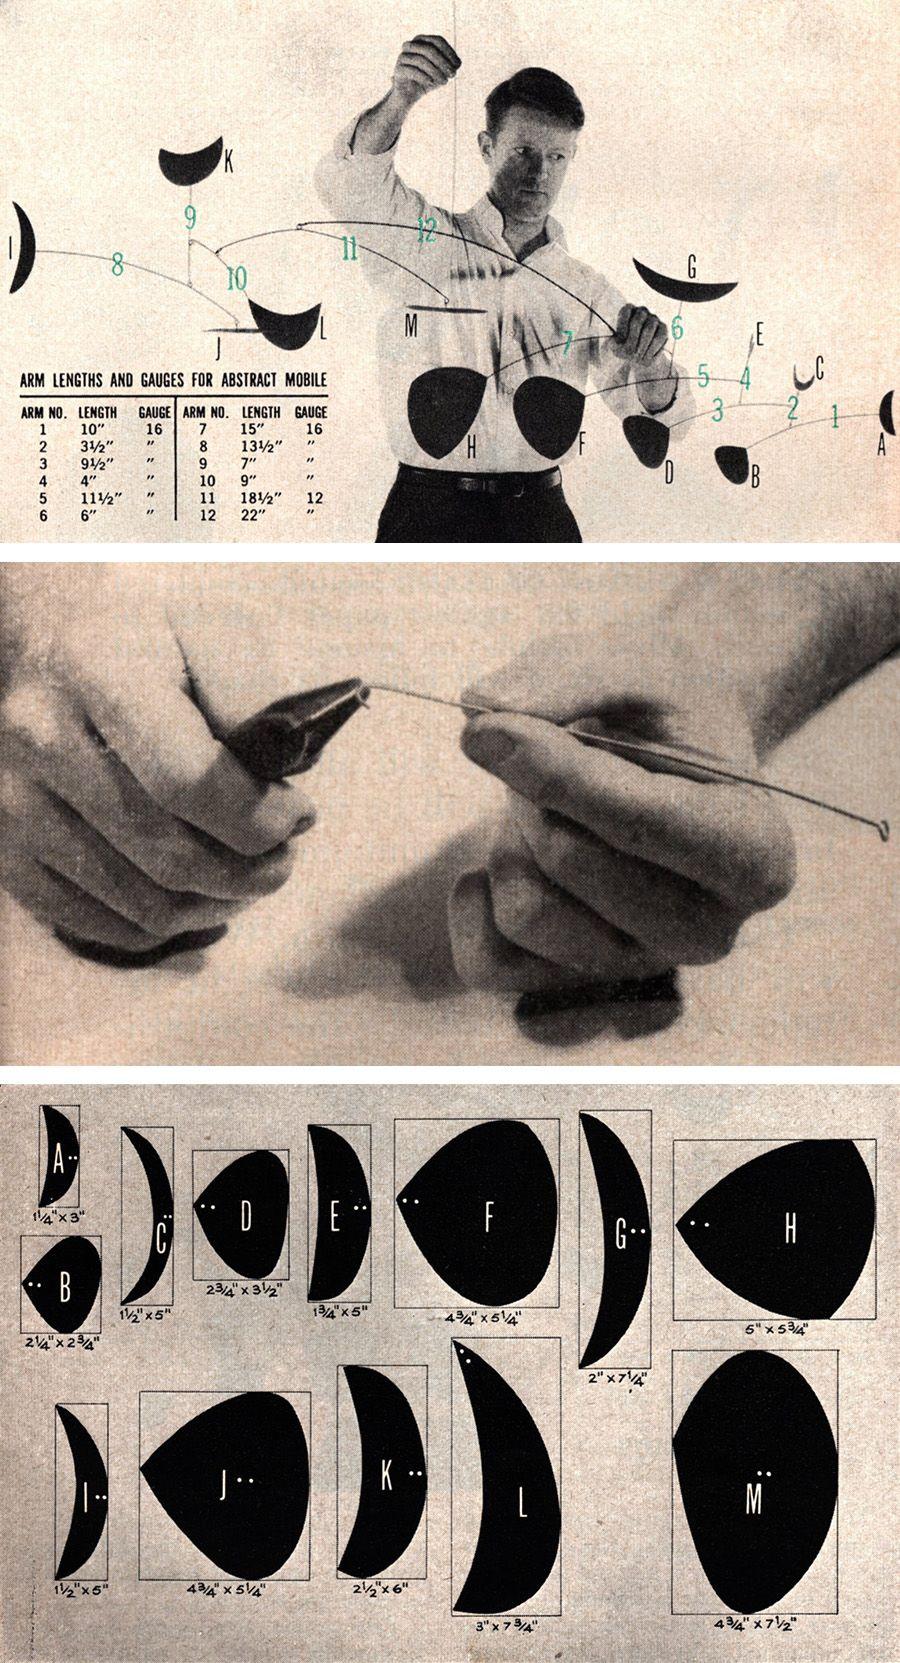 Cut shapes from cardboard or lightgauge sheet metal for